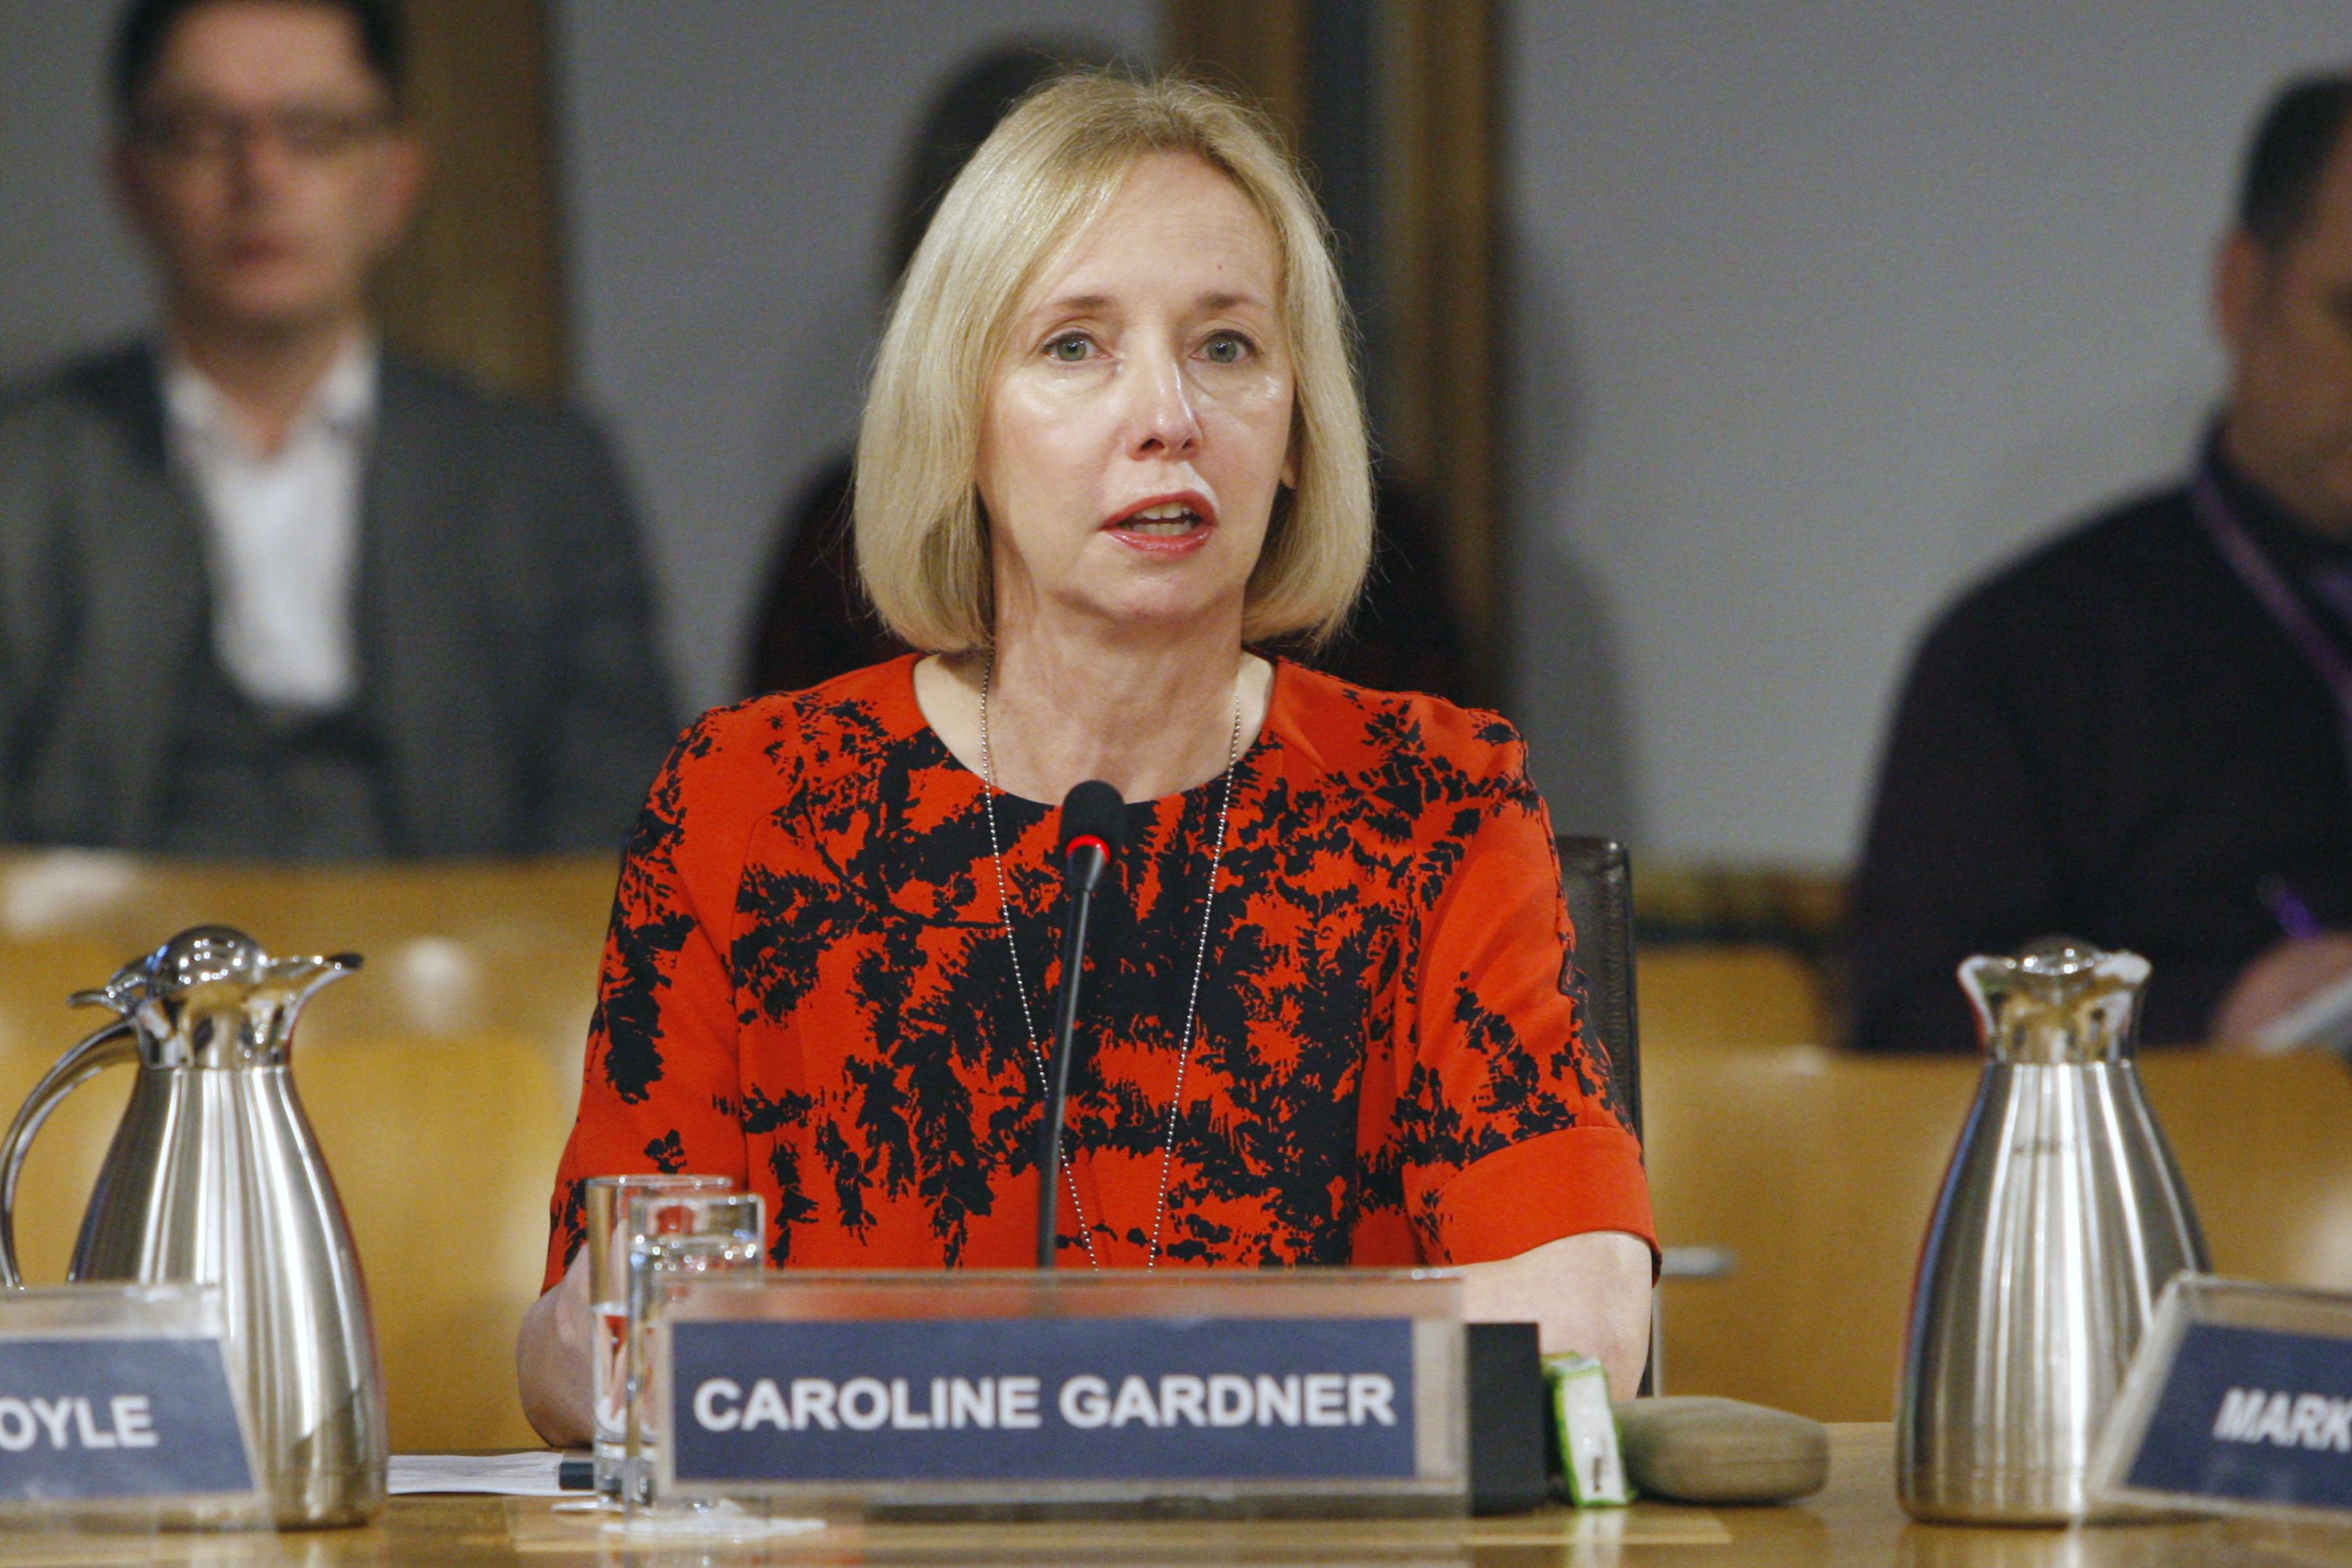 Caroline Gardner, Auditor General (Andrew Cowan/Scottish Parliament)